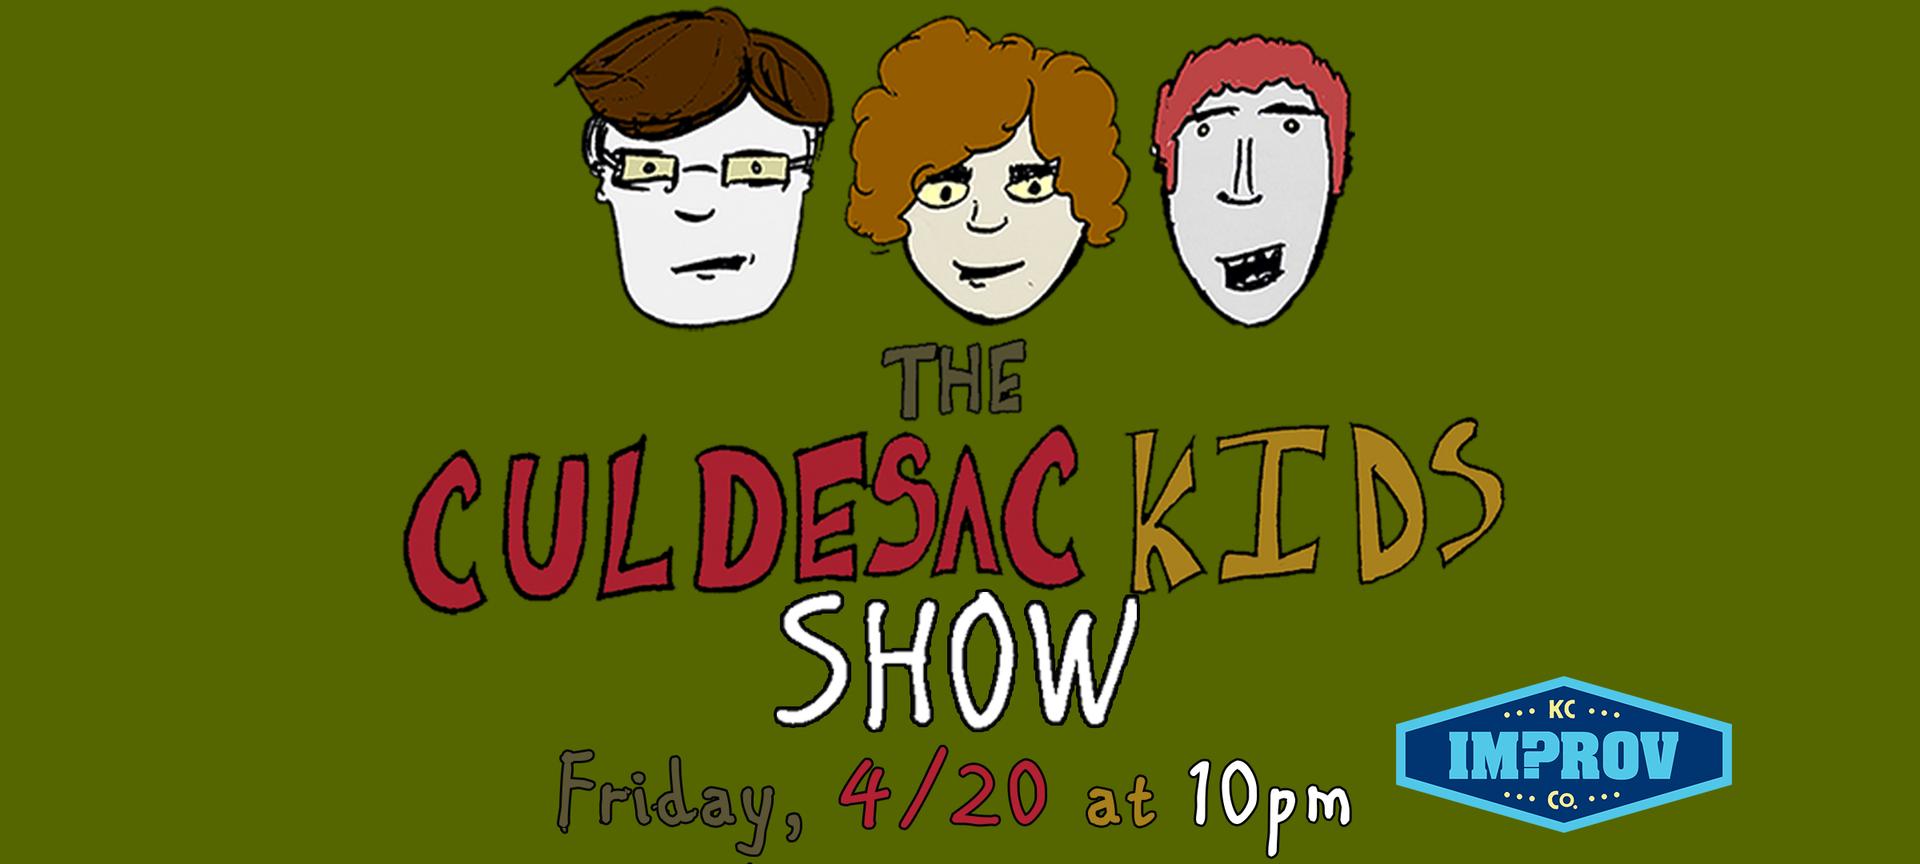 The-Culdesac-Kids-Show---Eventbrite.png